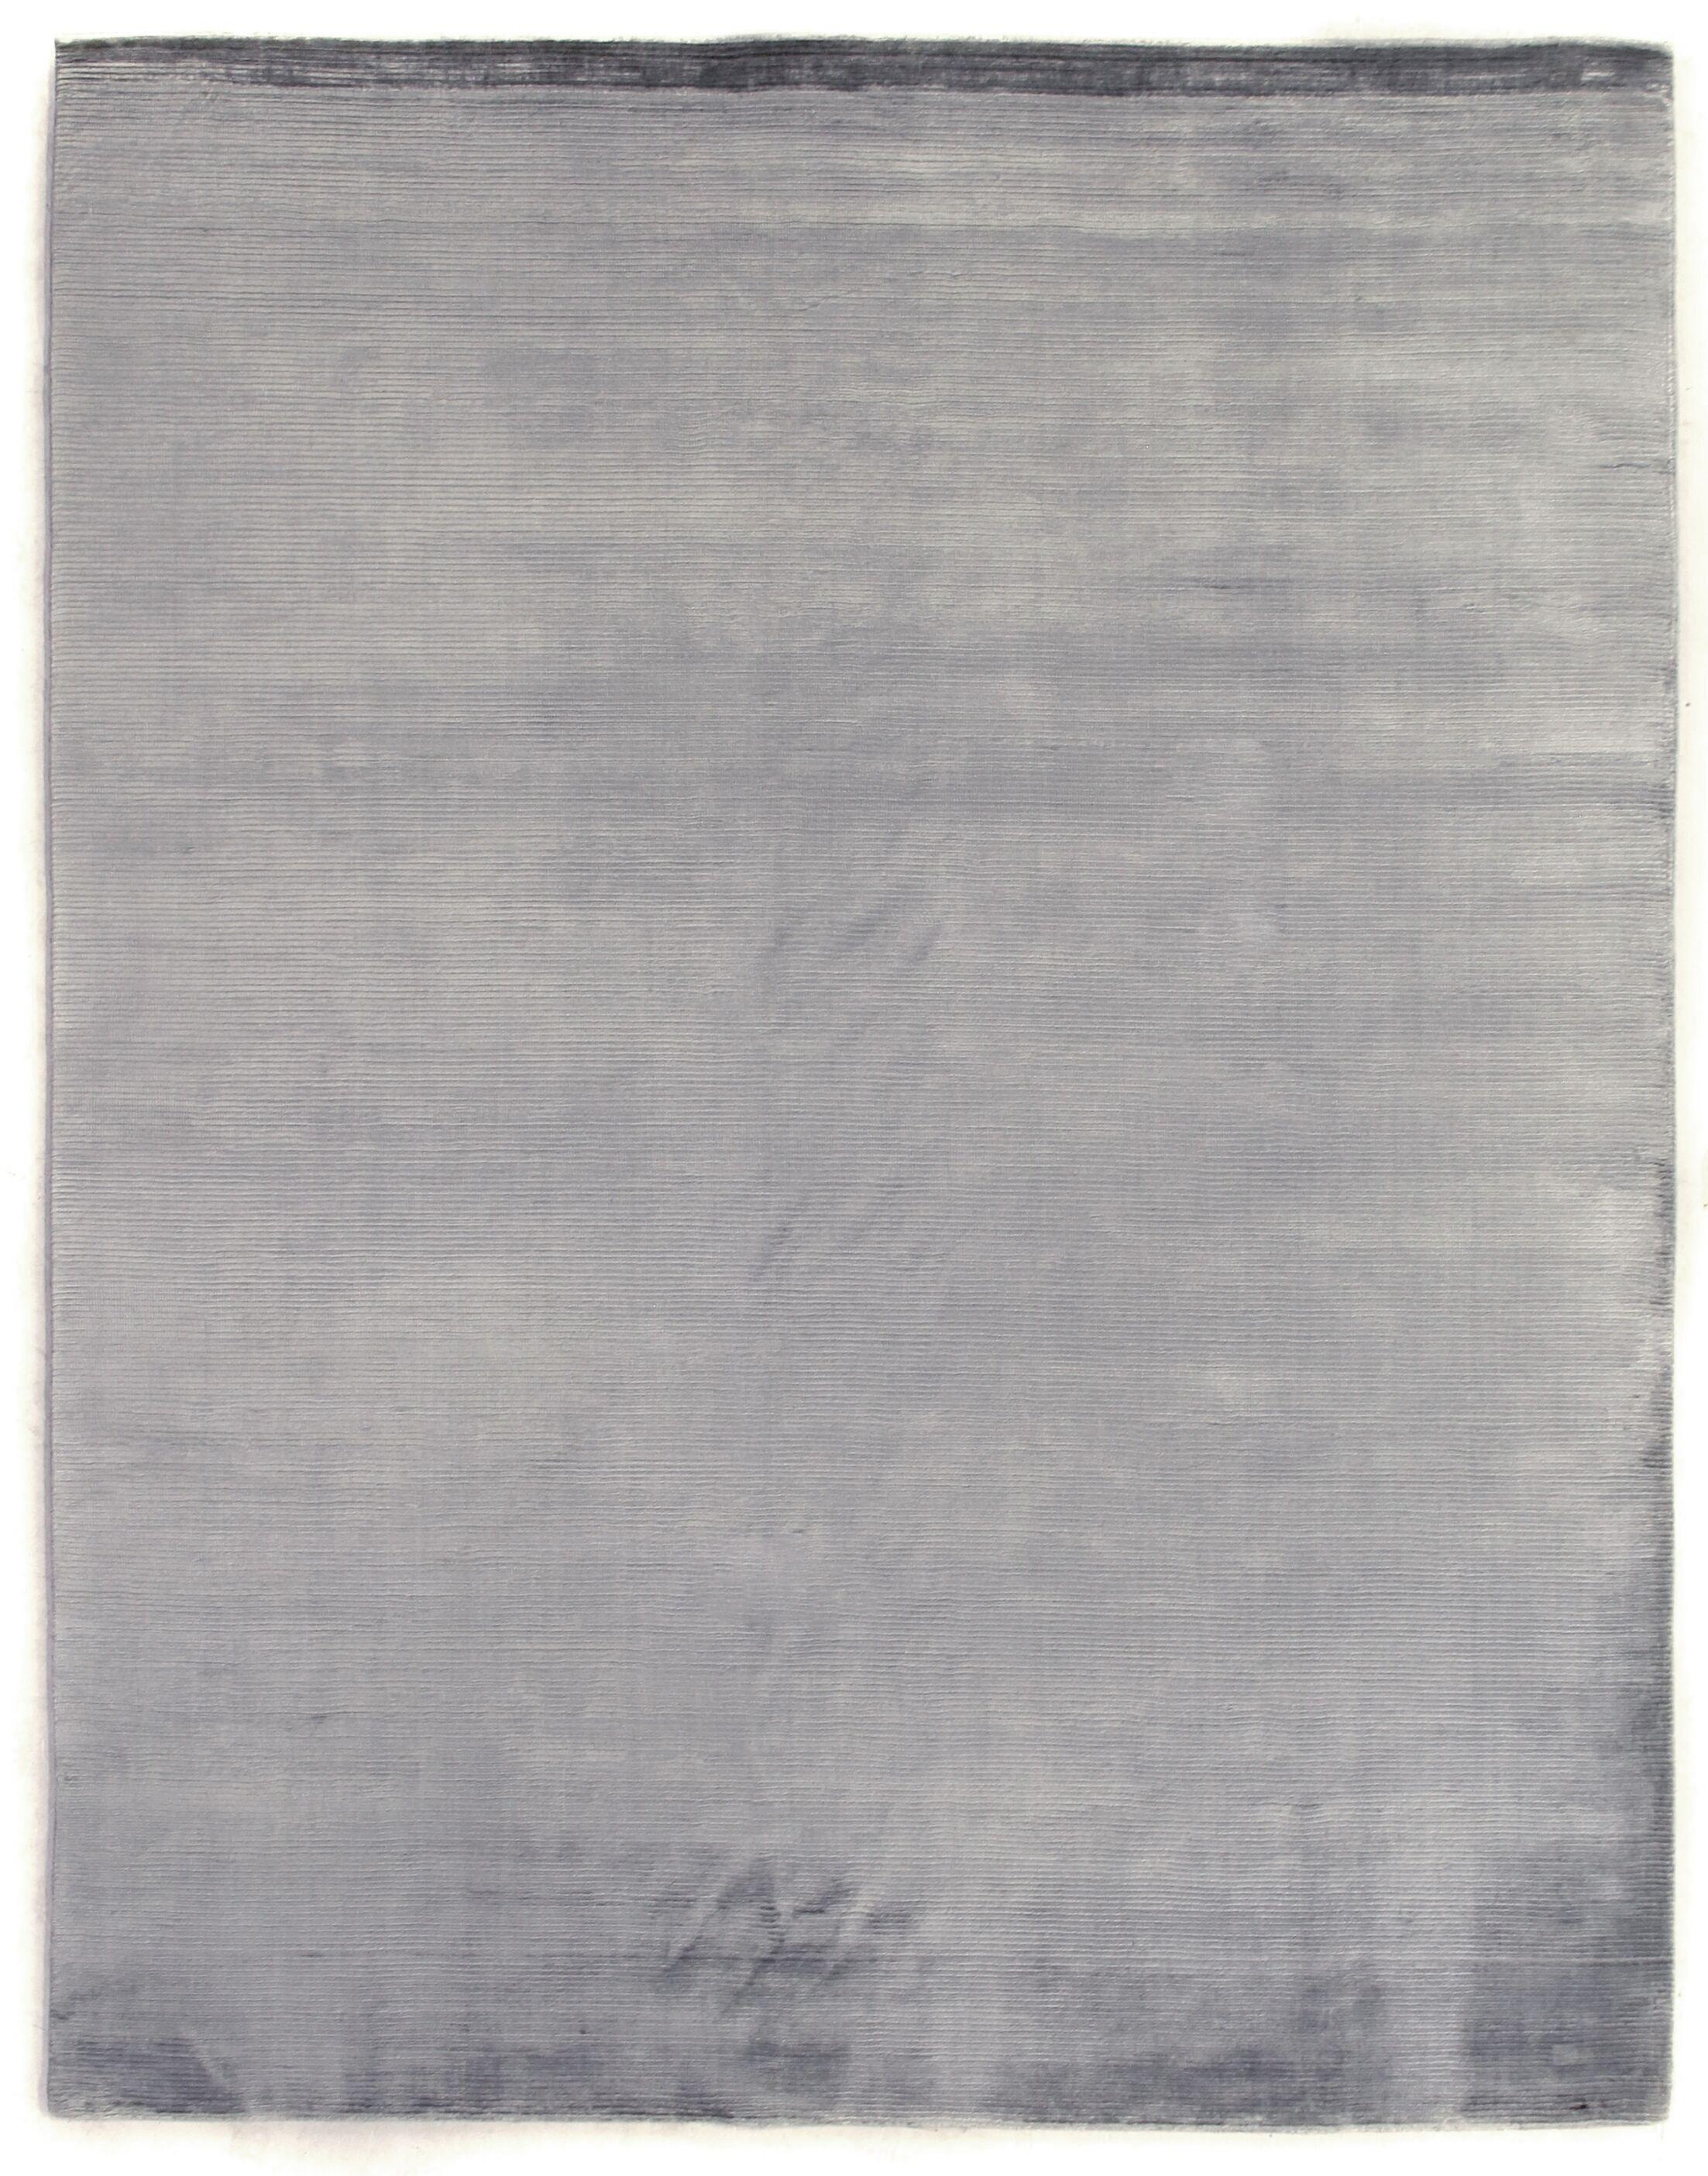 Dove Hand-Woven Gray Area Rug Rug Size: 4' x 6'